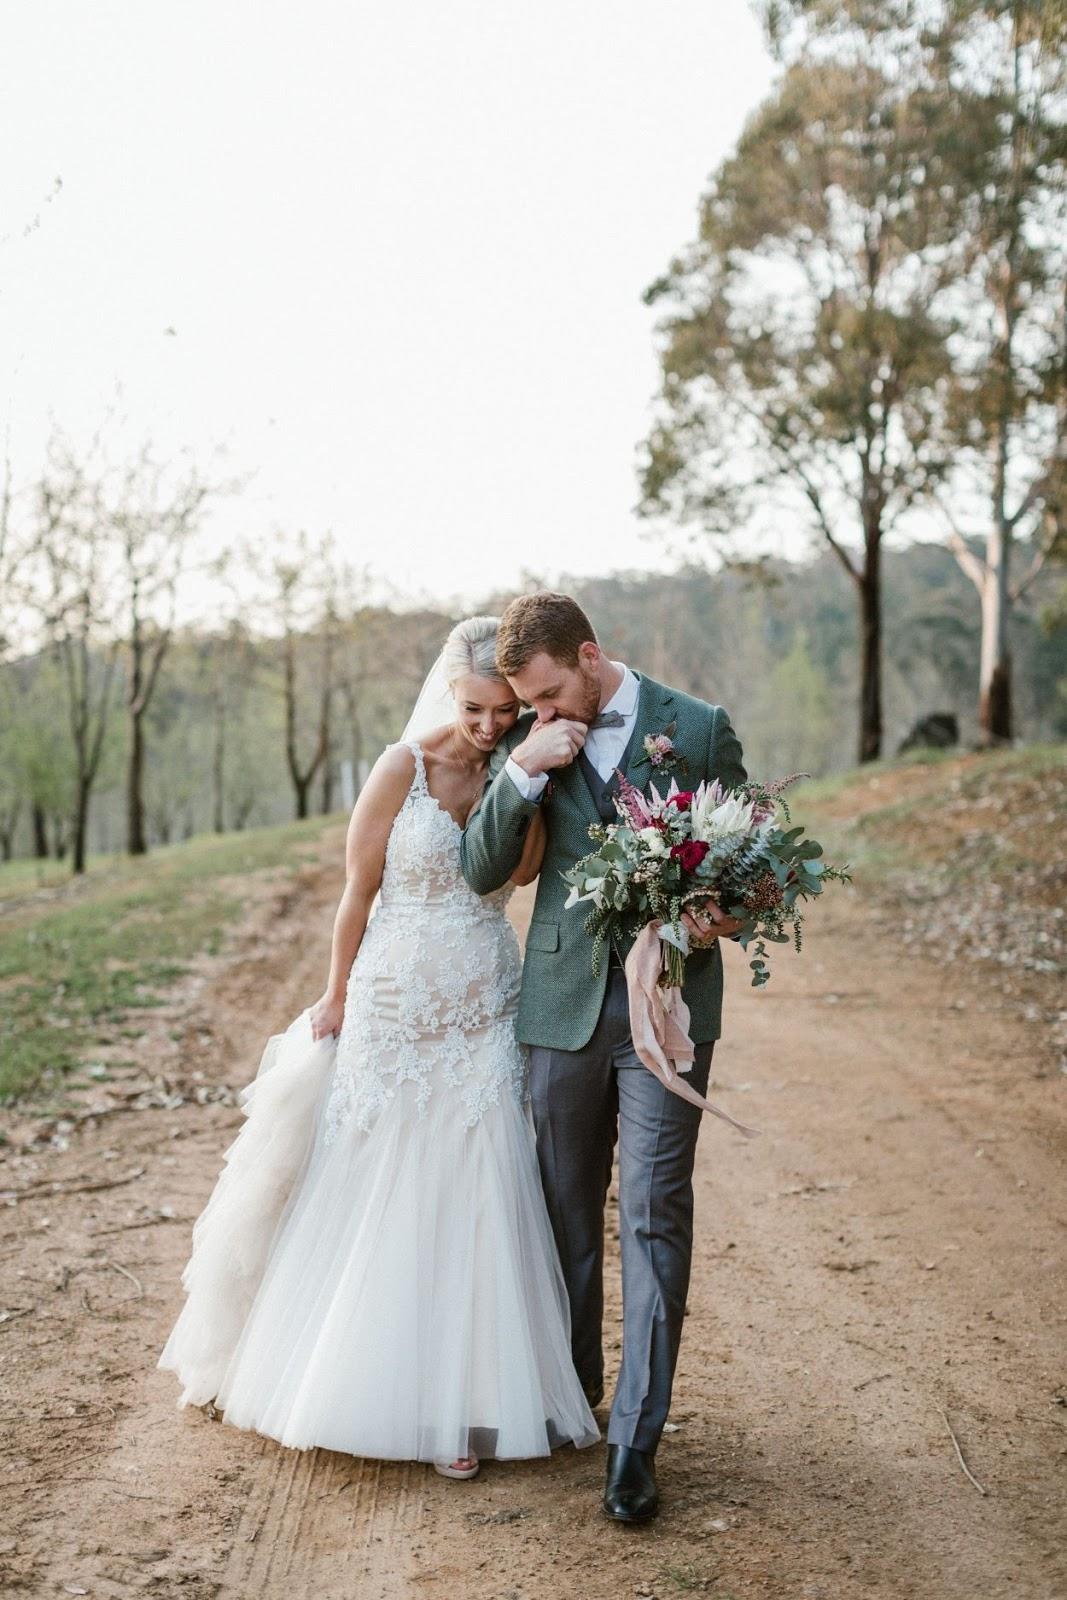 melissa mills photography pemberton perth wedding bridal gown venue floral designer